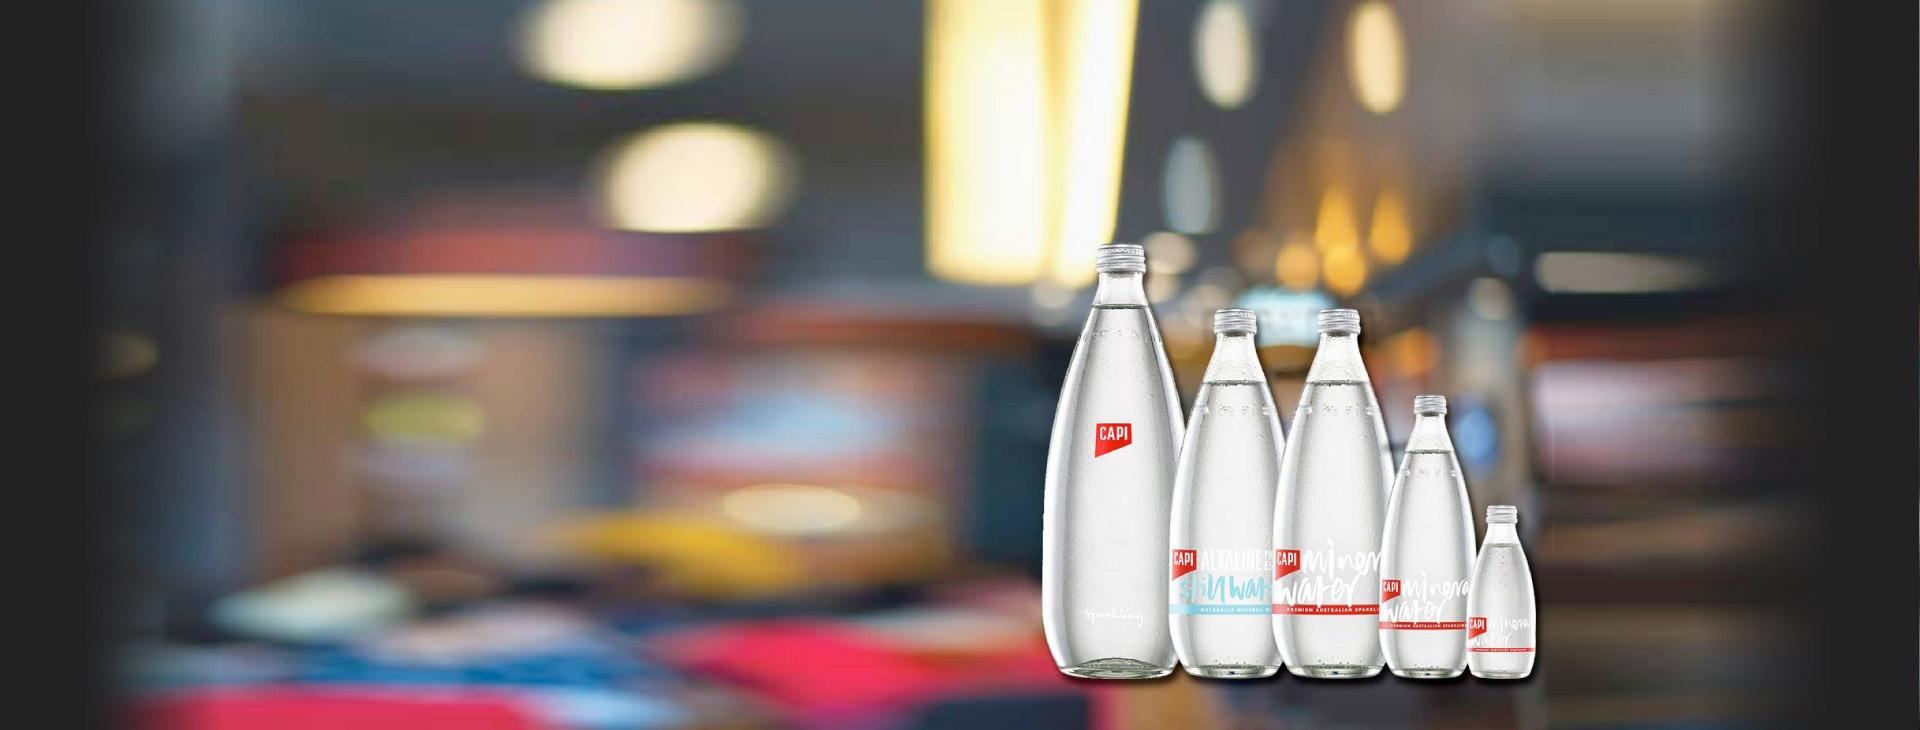 Premium Beverage Wholesaler & Distributors | DrinkScene